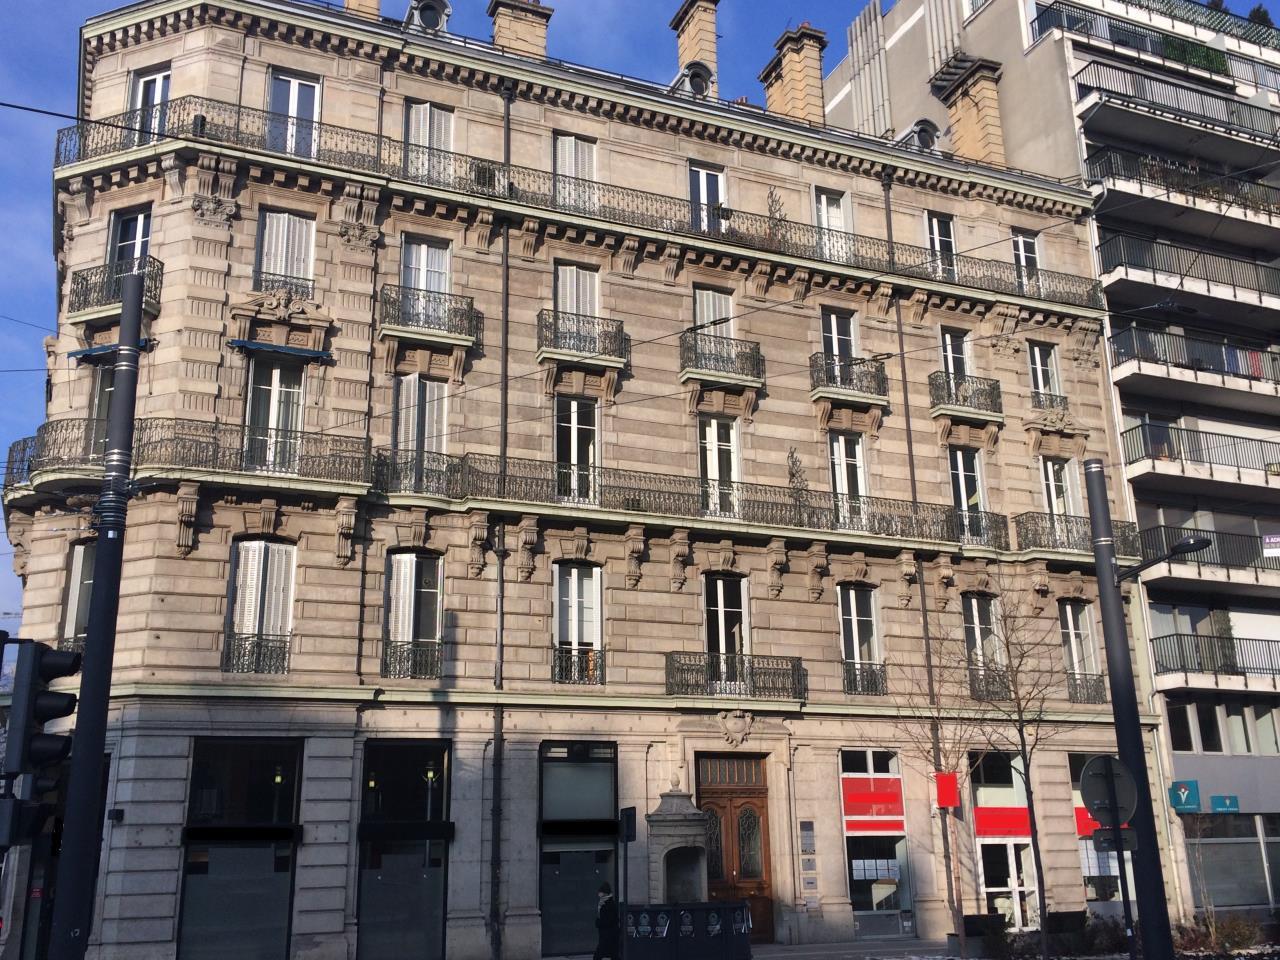 Location Bureau Grenoble 38000 320m Bureauxlocaux Com